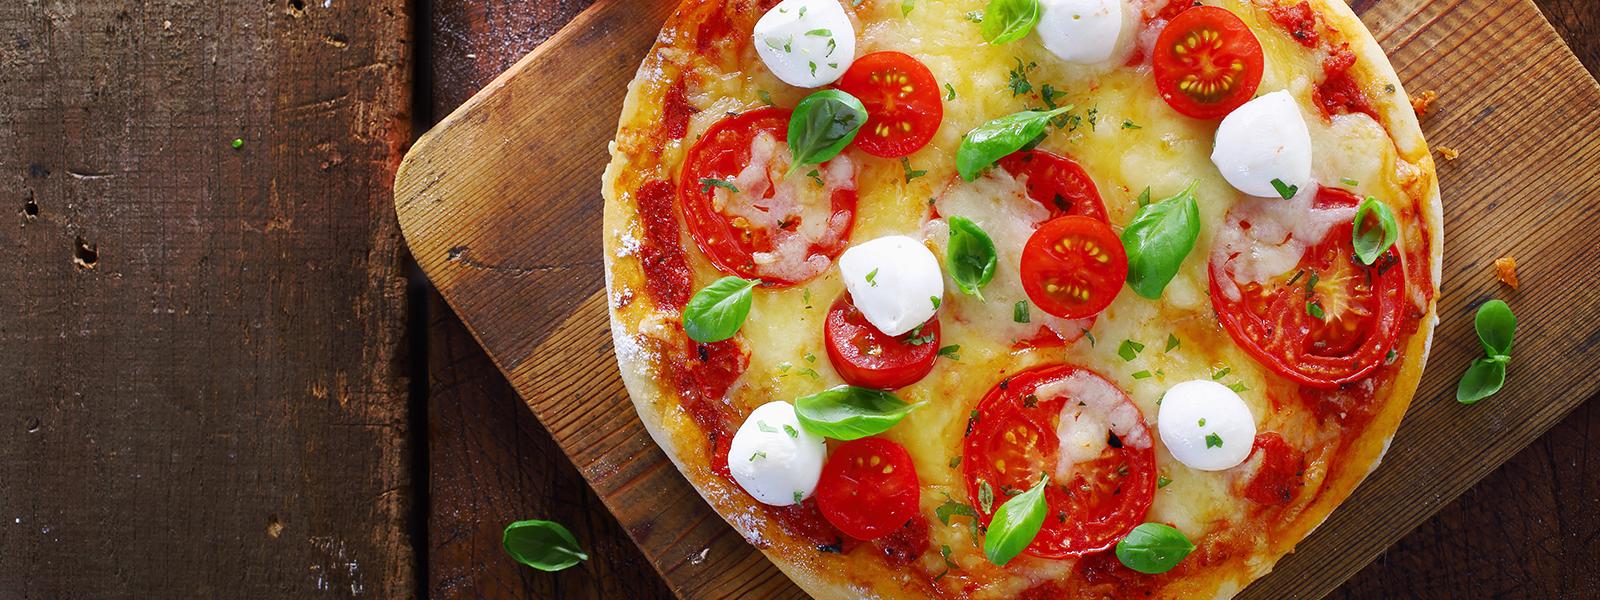 Kings Kebab Pizza Kings Kebab Pizza Lowestoft